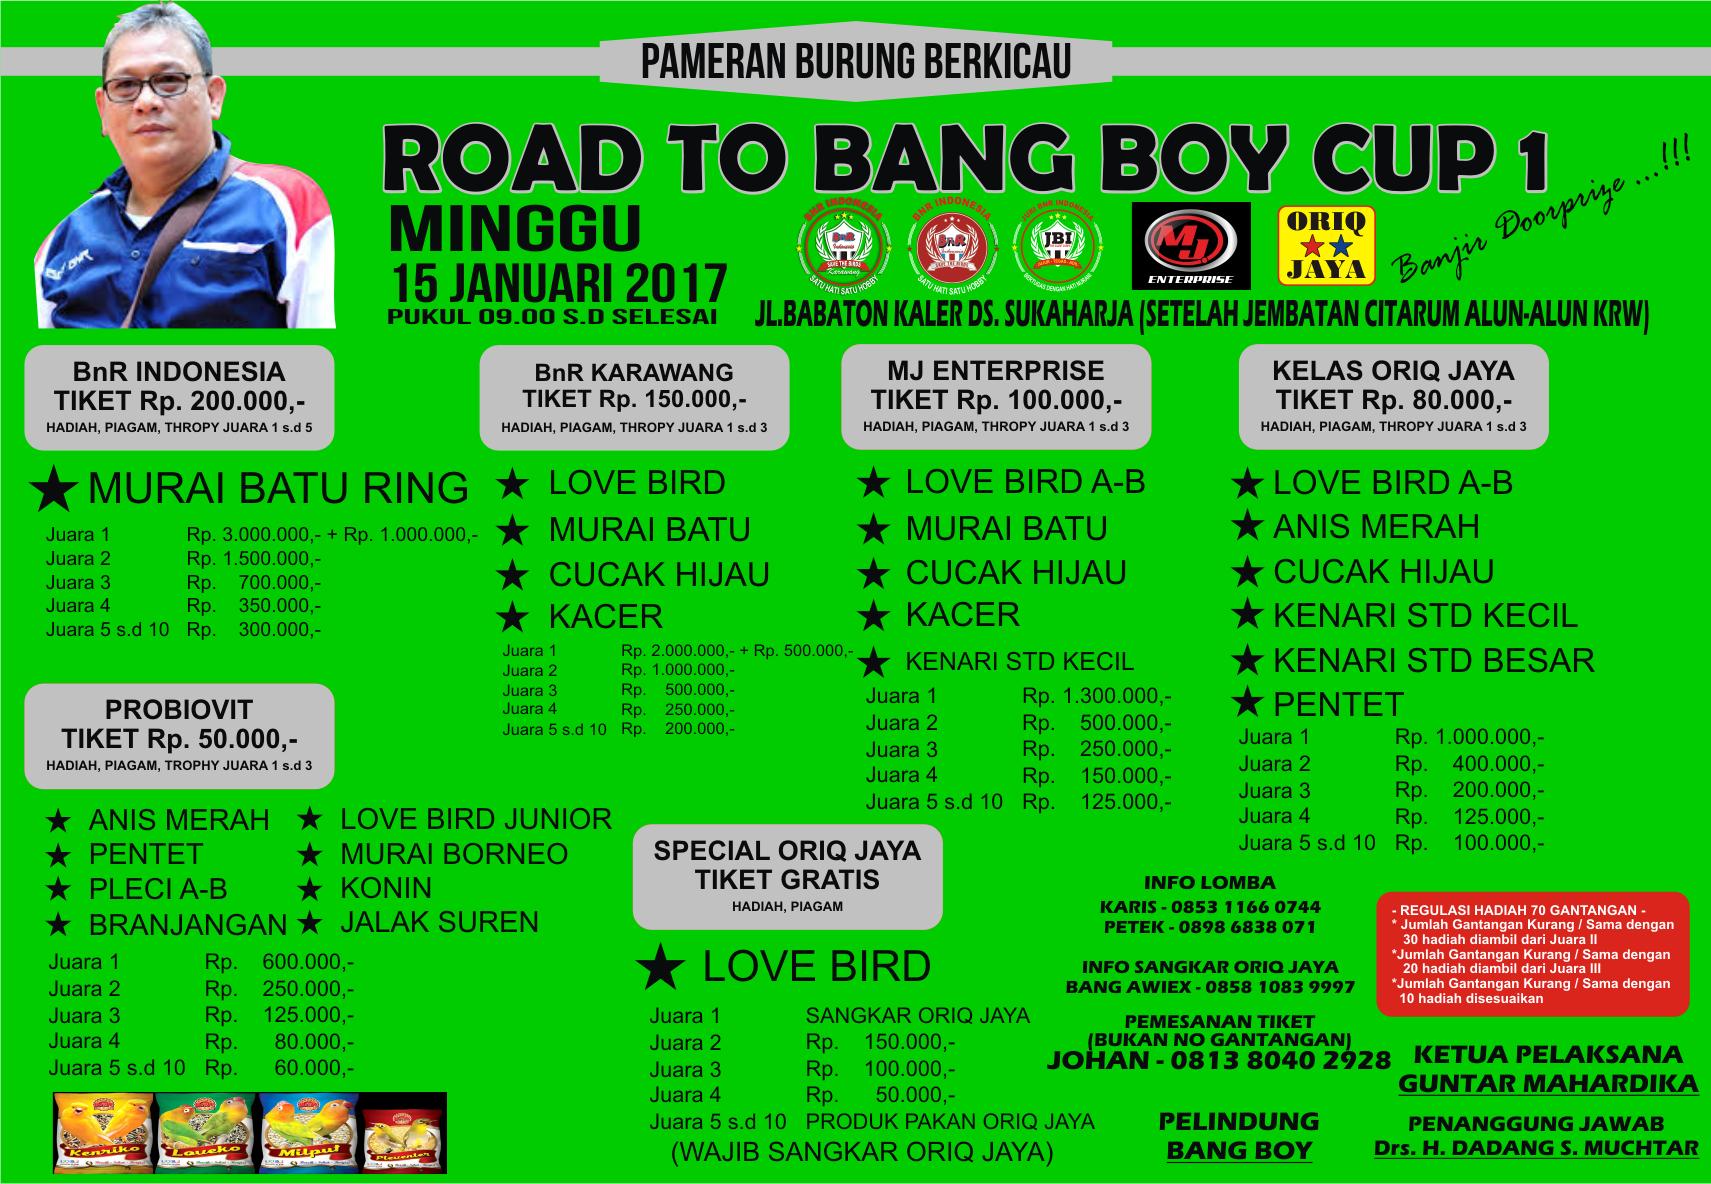 brosur lomba burung road to bang boy cup 1 15 januari 2017